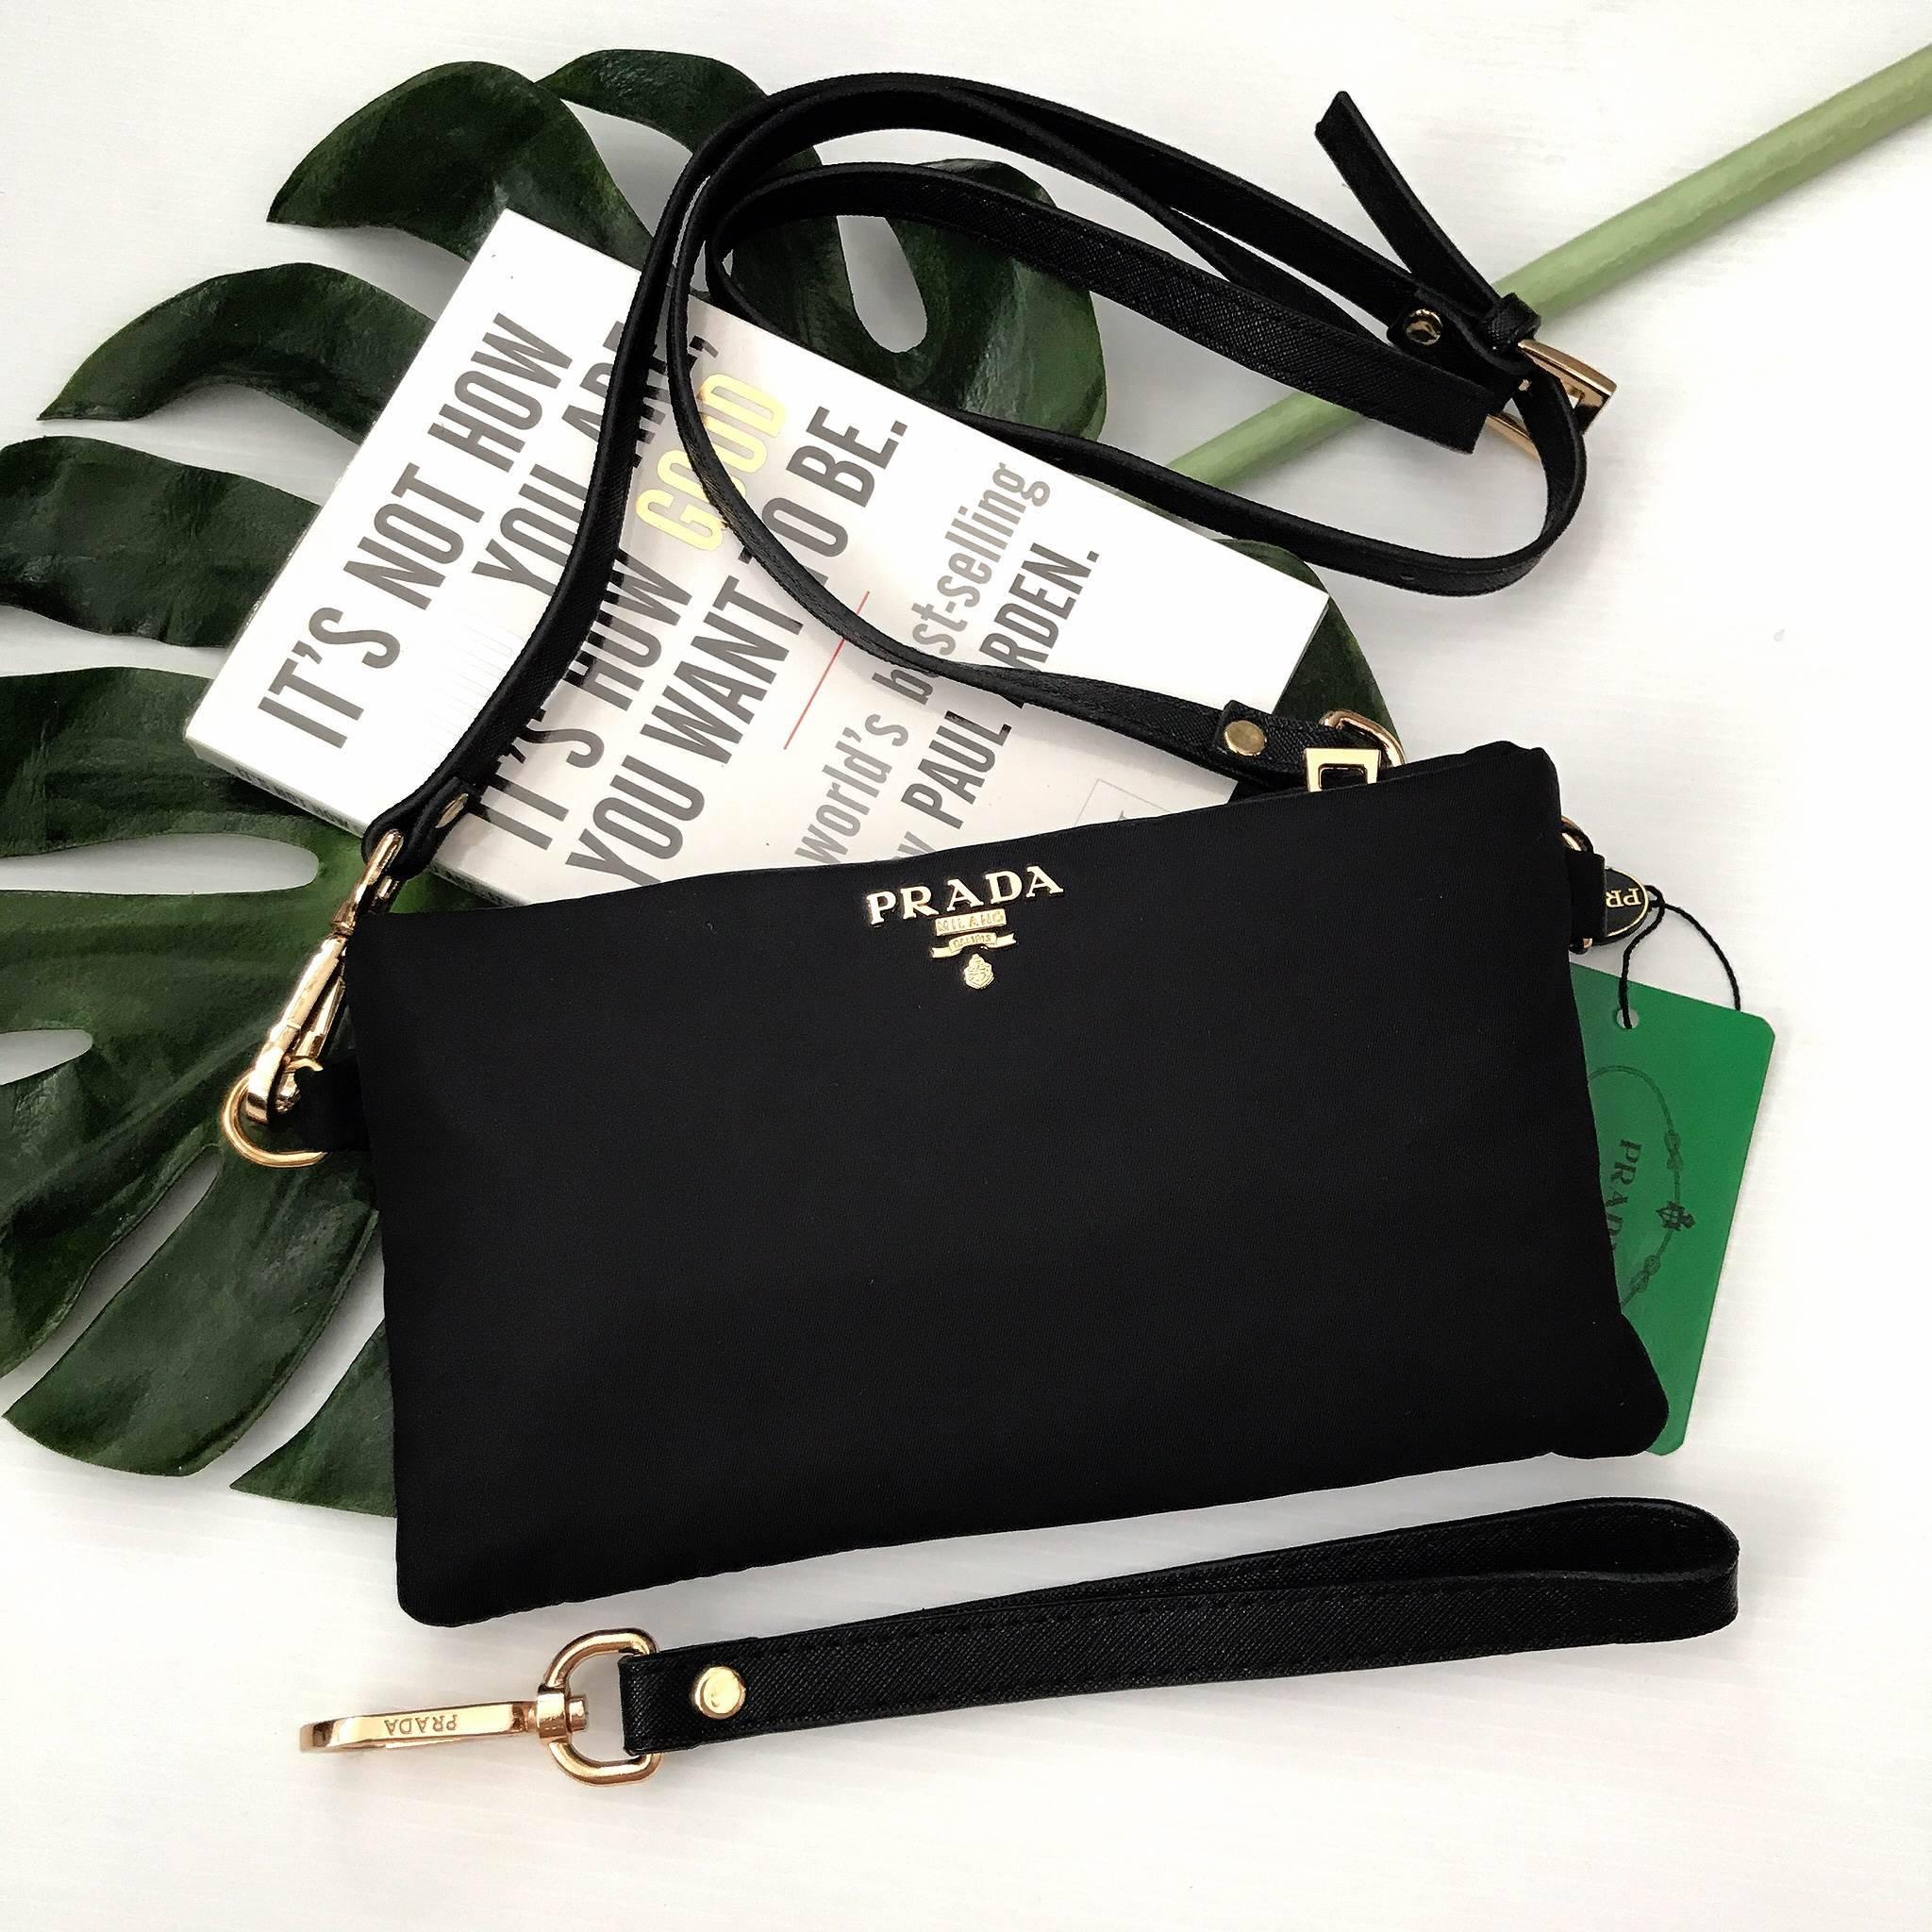 9514b93078cd63 มาใหม่ค้า กระเป๋า Premium Gift จากแบรนด์ Prada ทรง crossbody อีกรุ่น